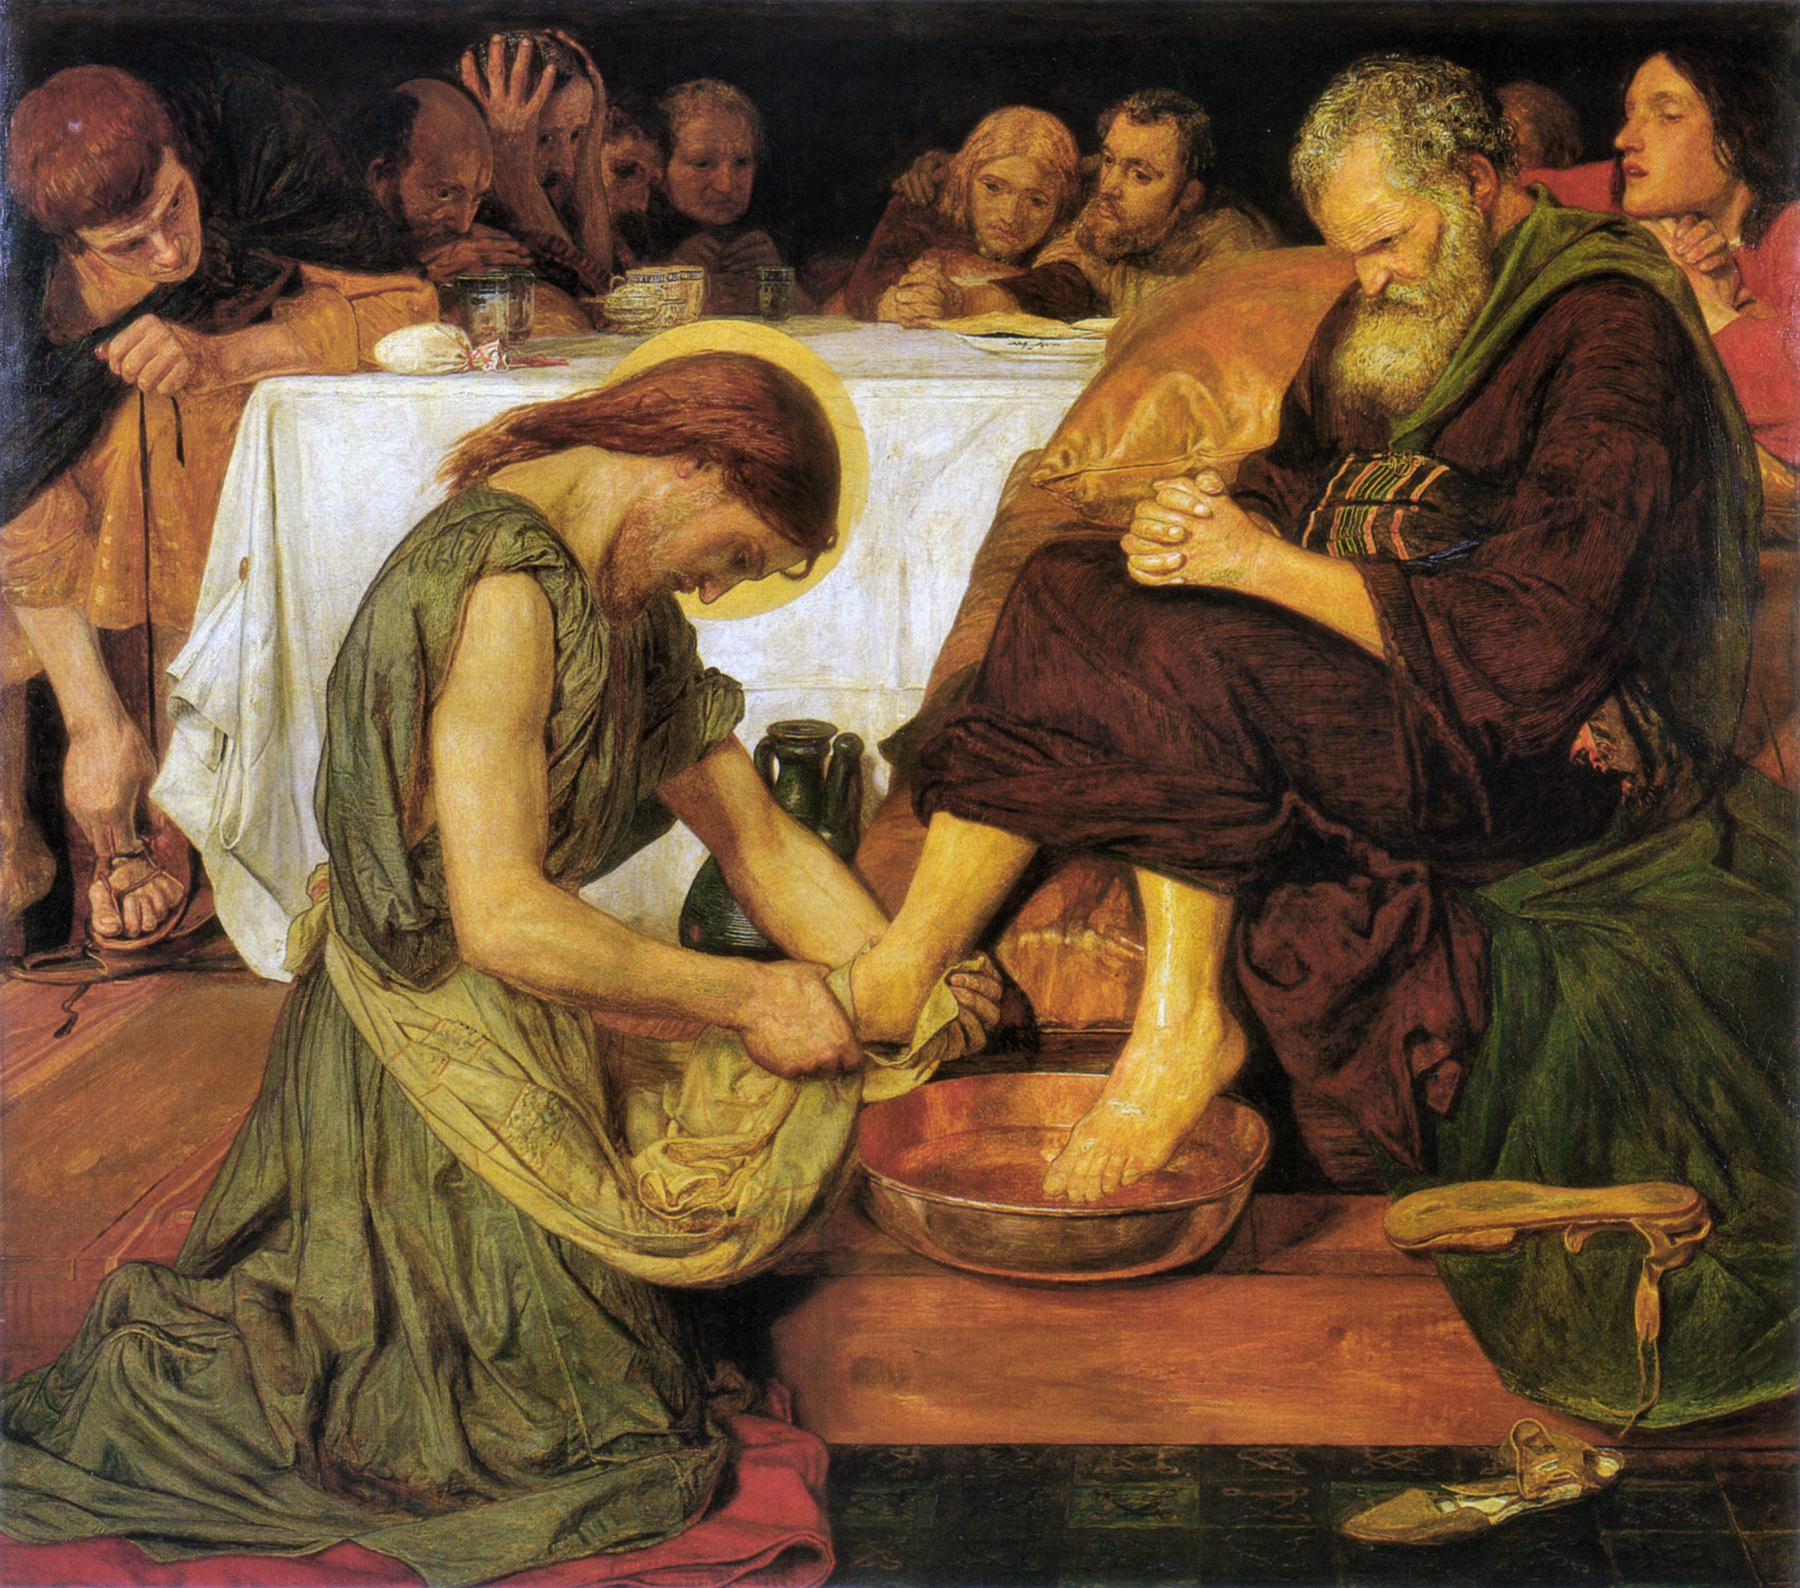 Bilde:Ford Madox Brown: Jesus Washing Peter's Feet (1852) (Wikimedia)